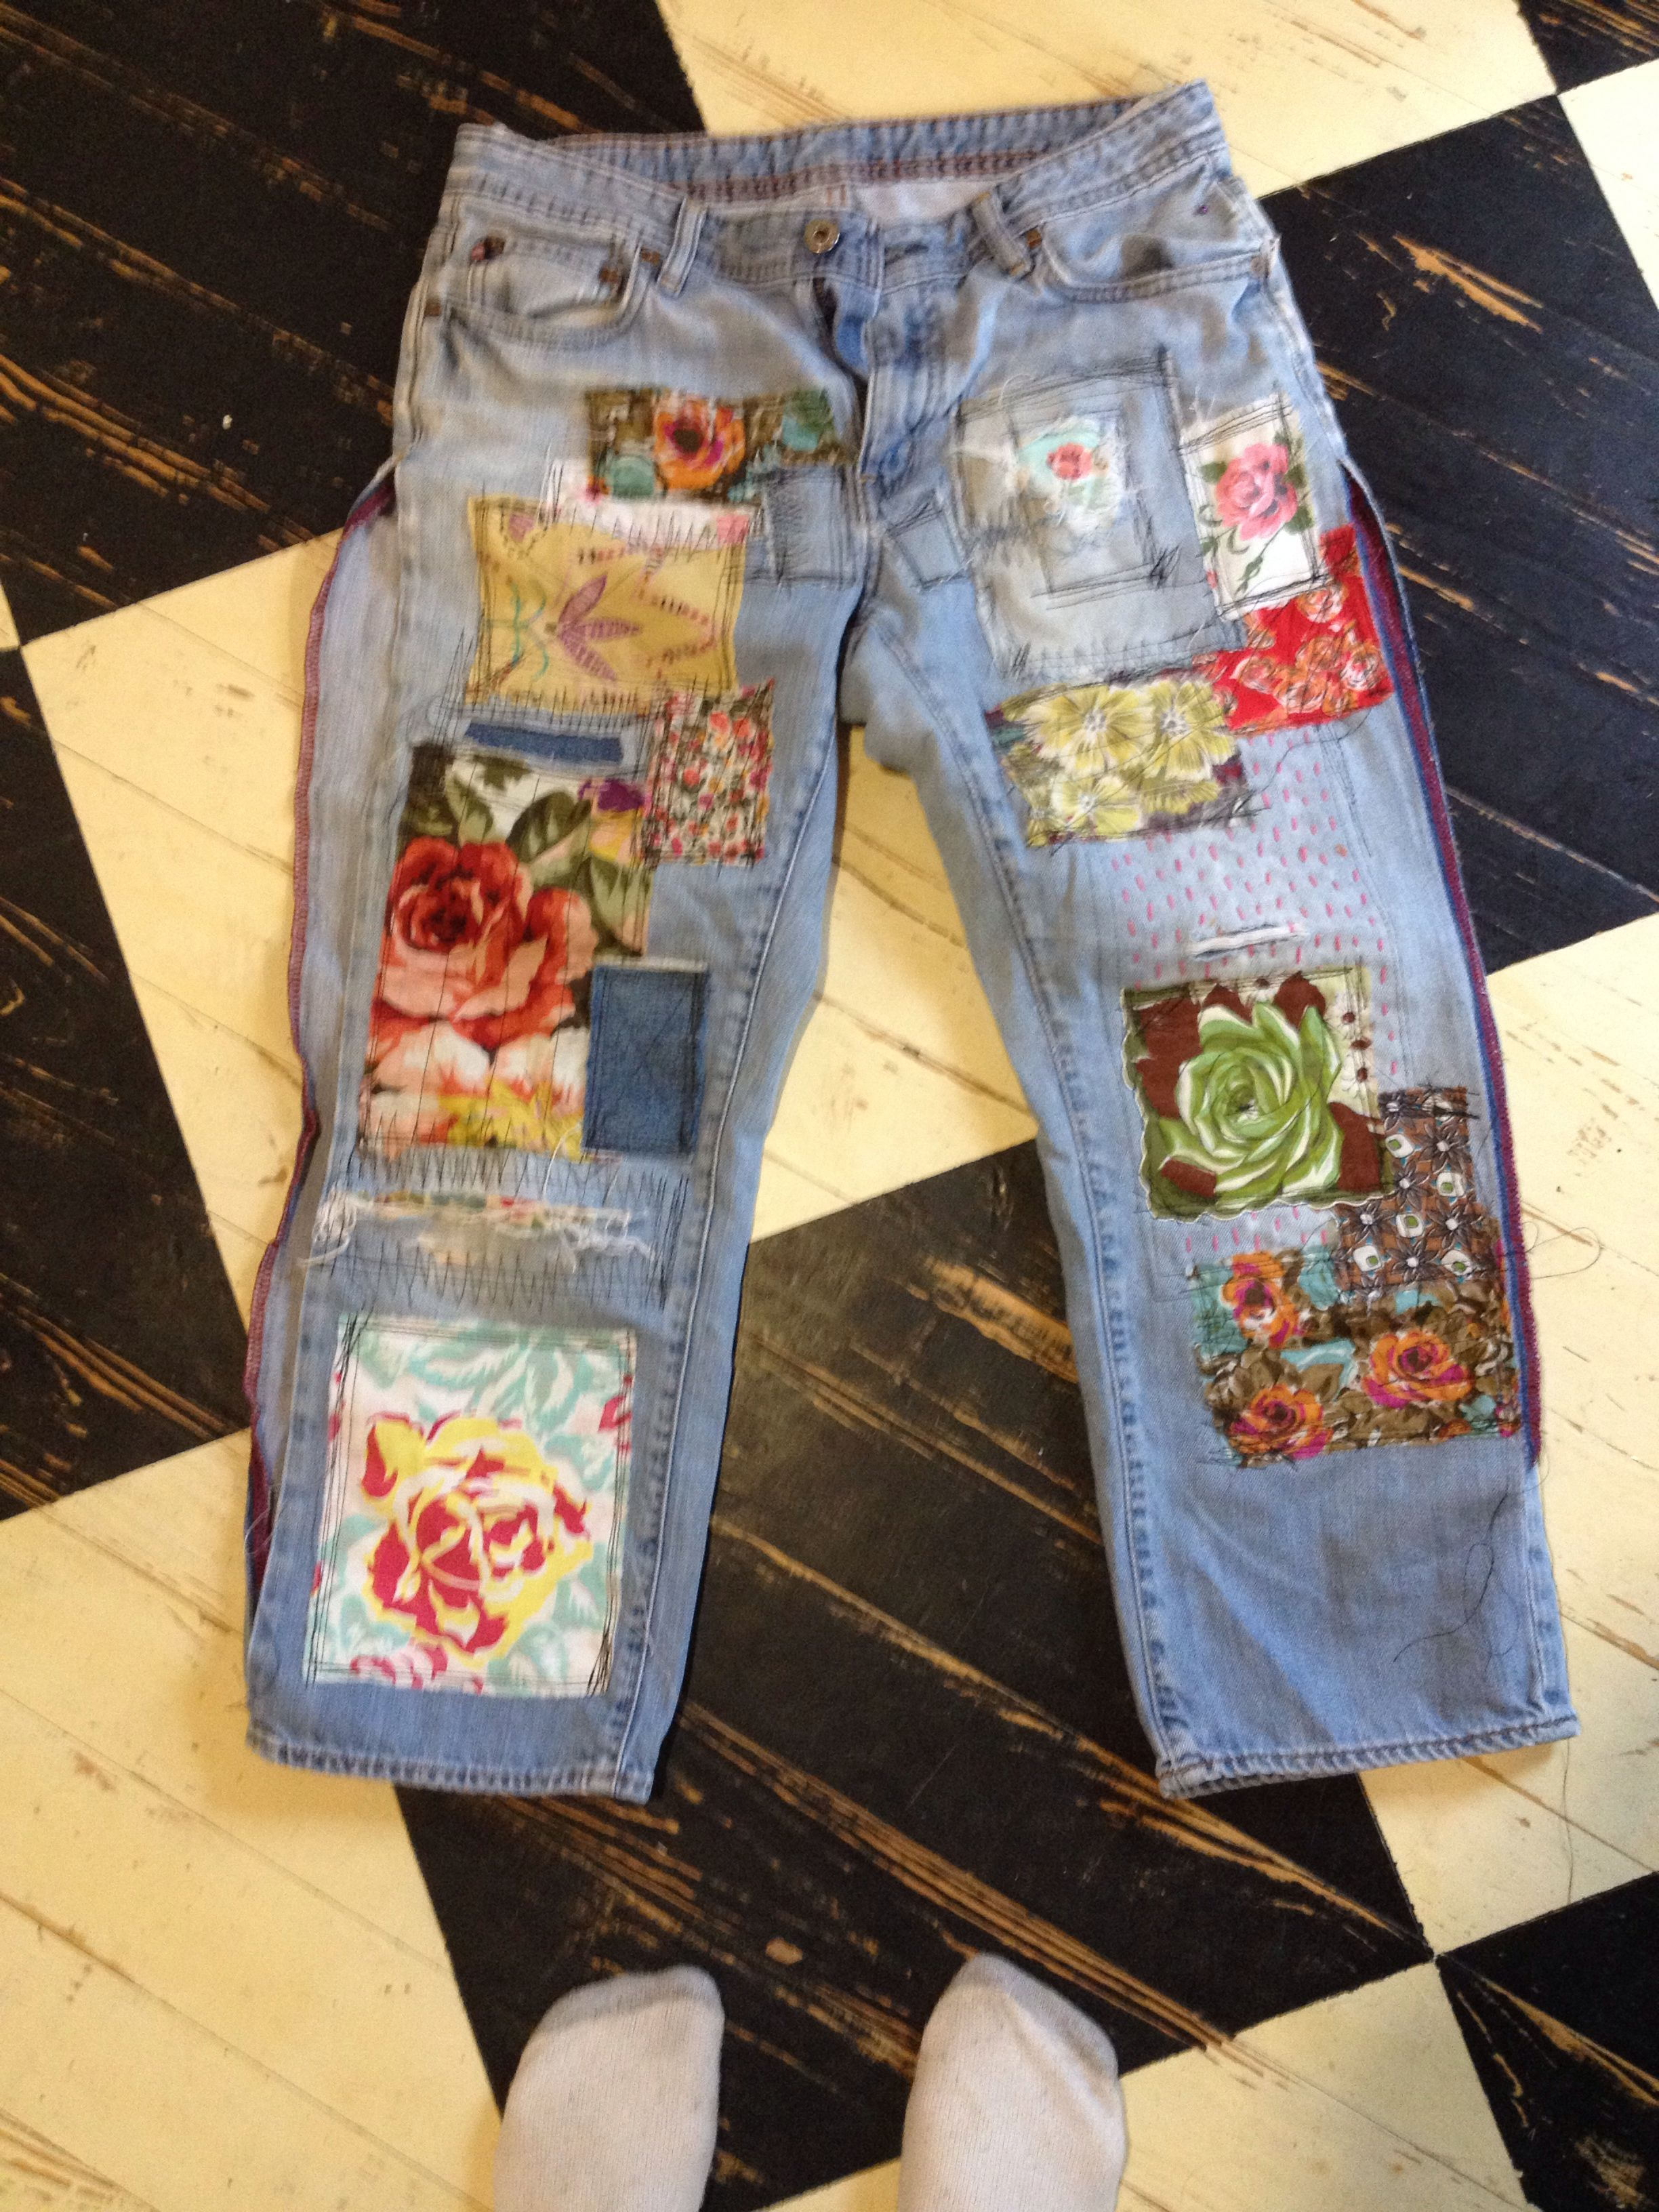 Clothing stores wichita falls tx